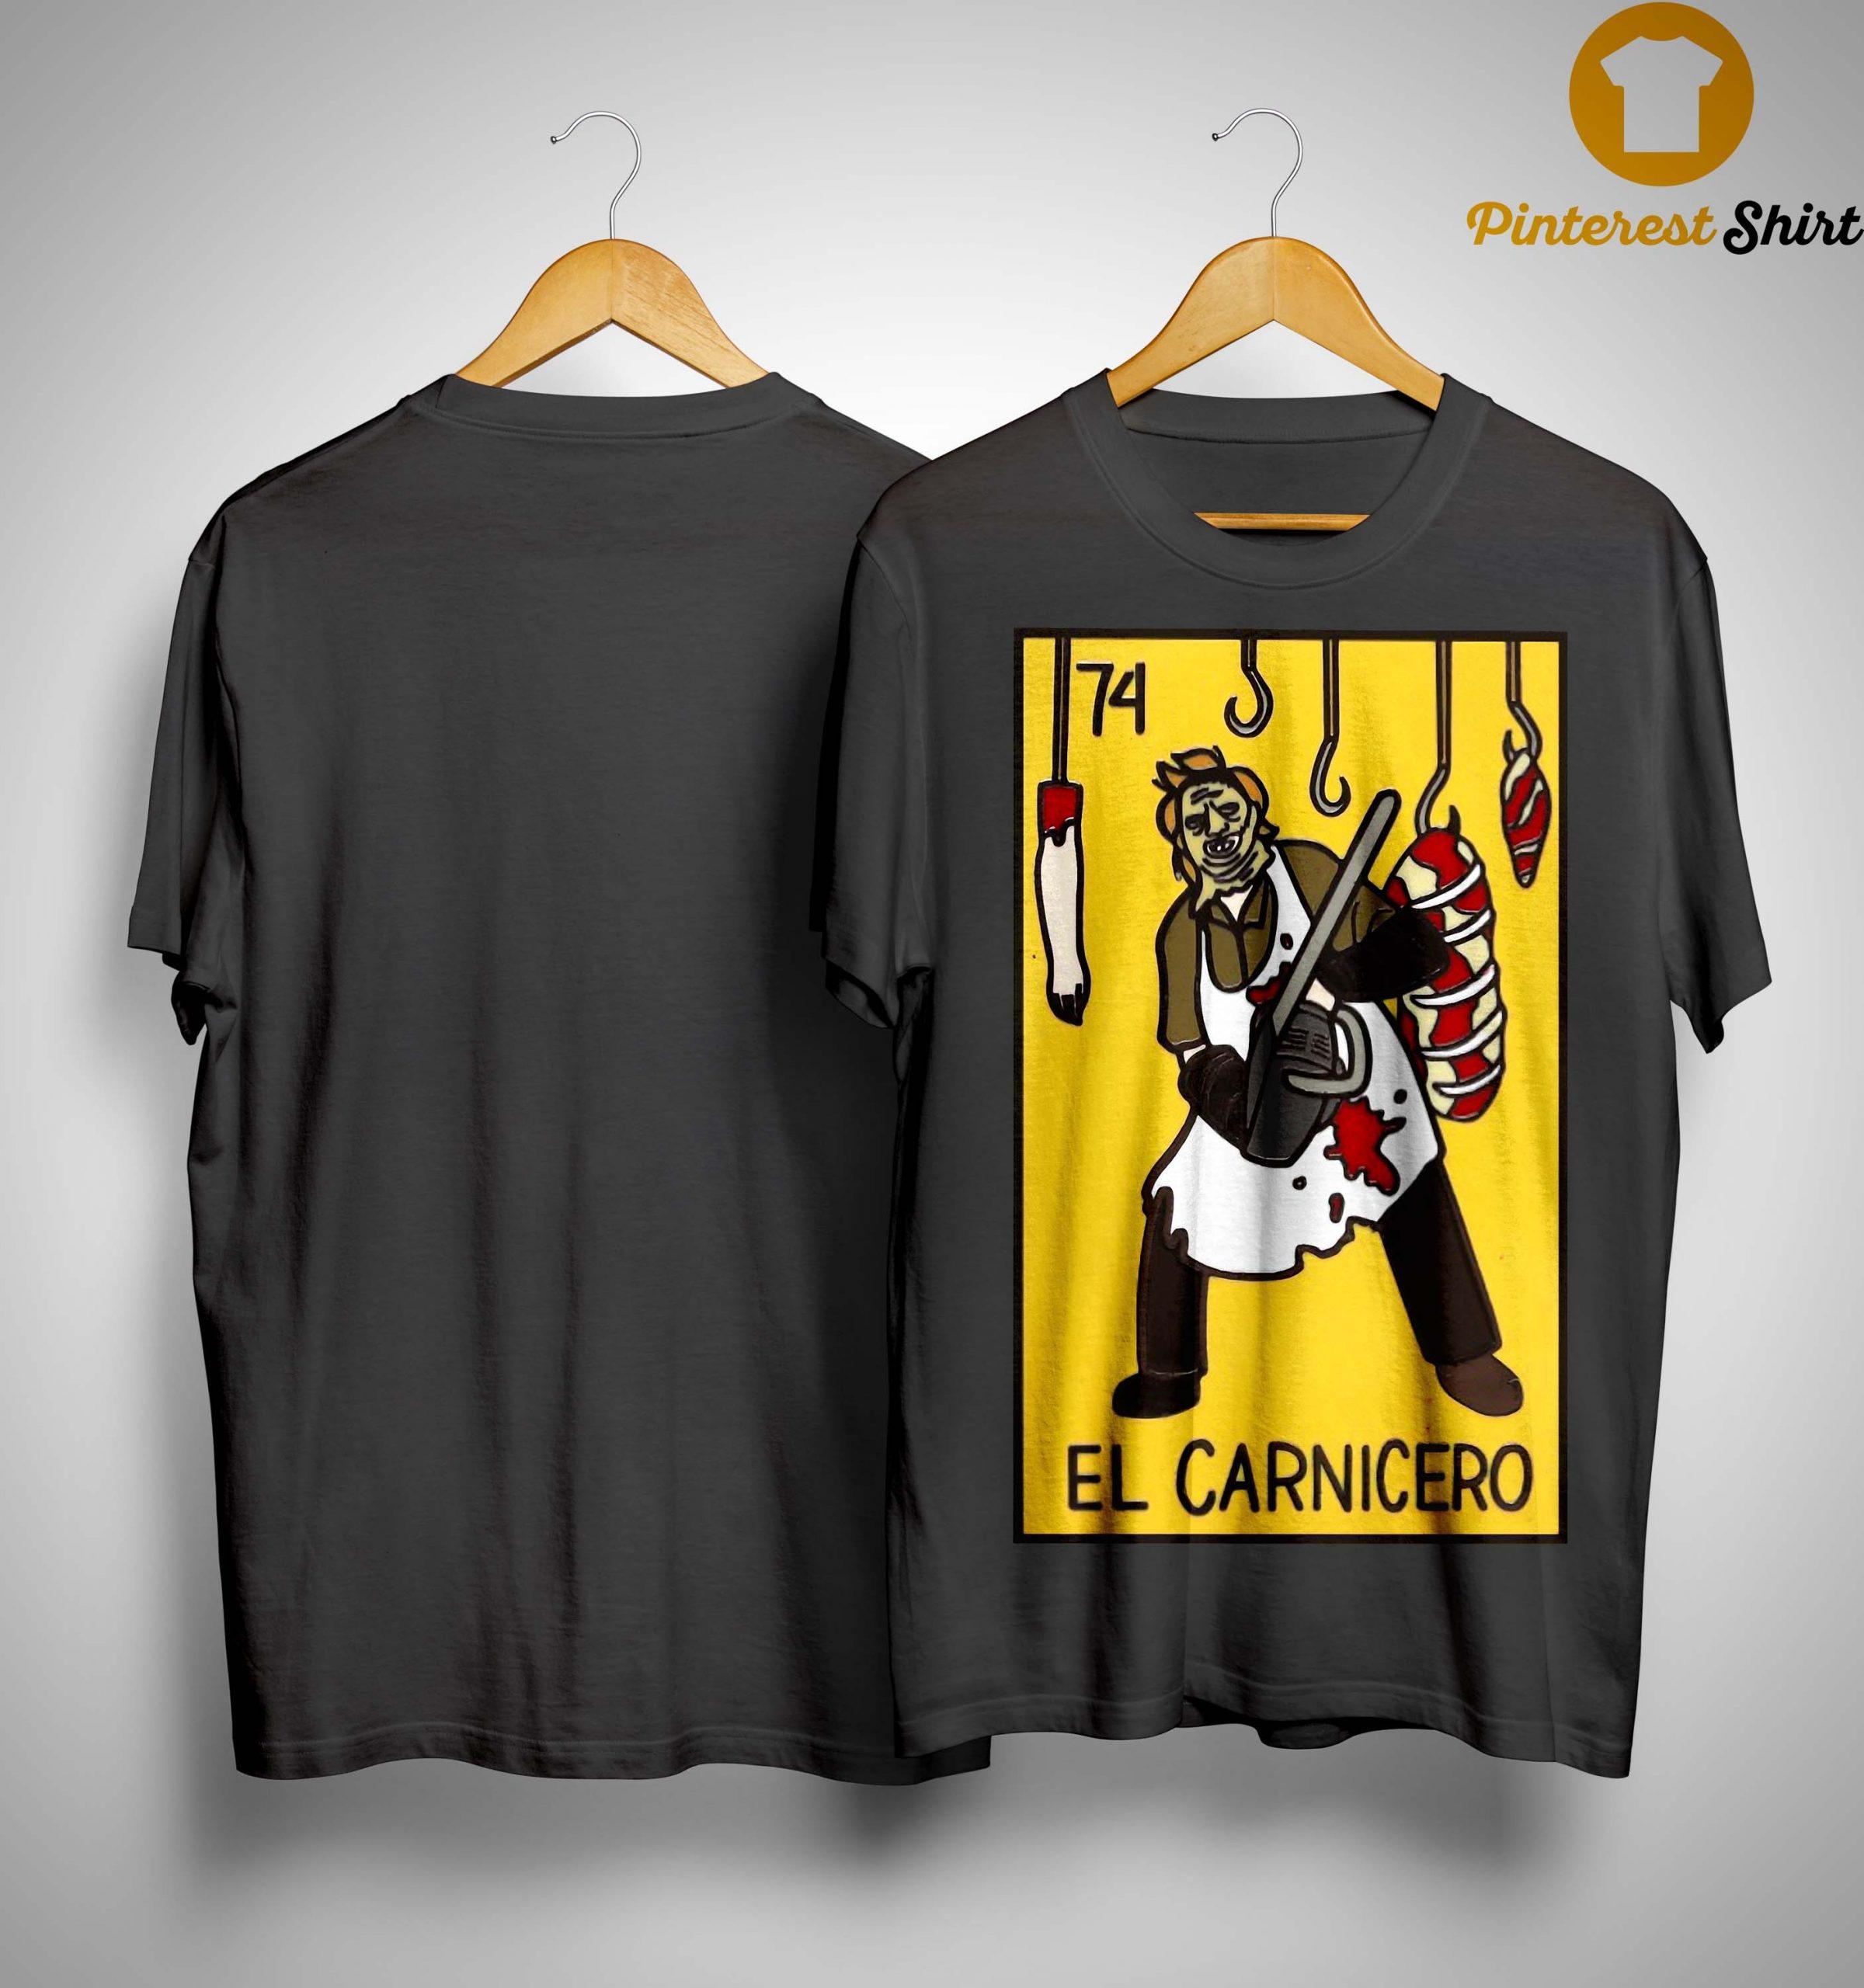 74 El Carnicero Shirt